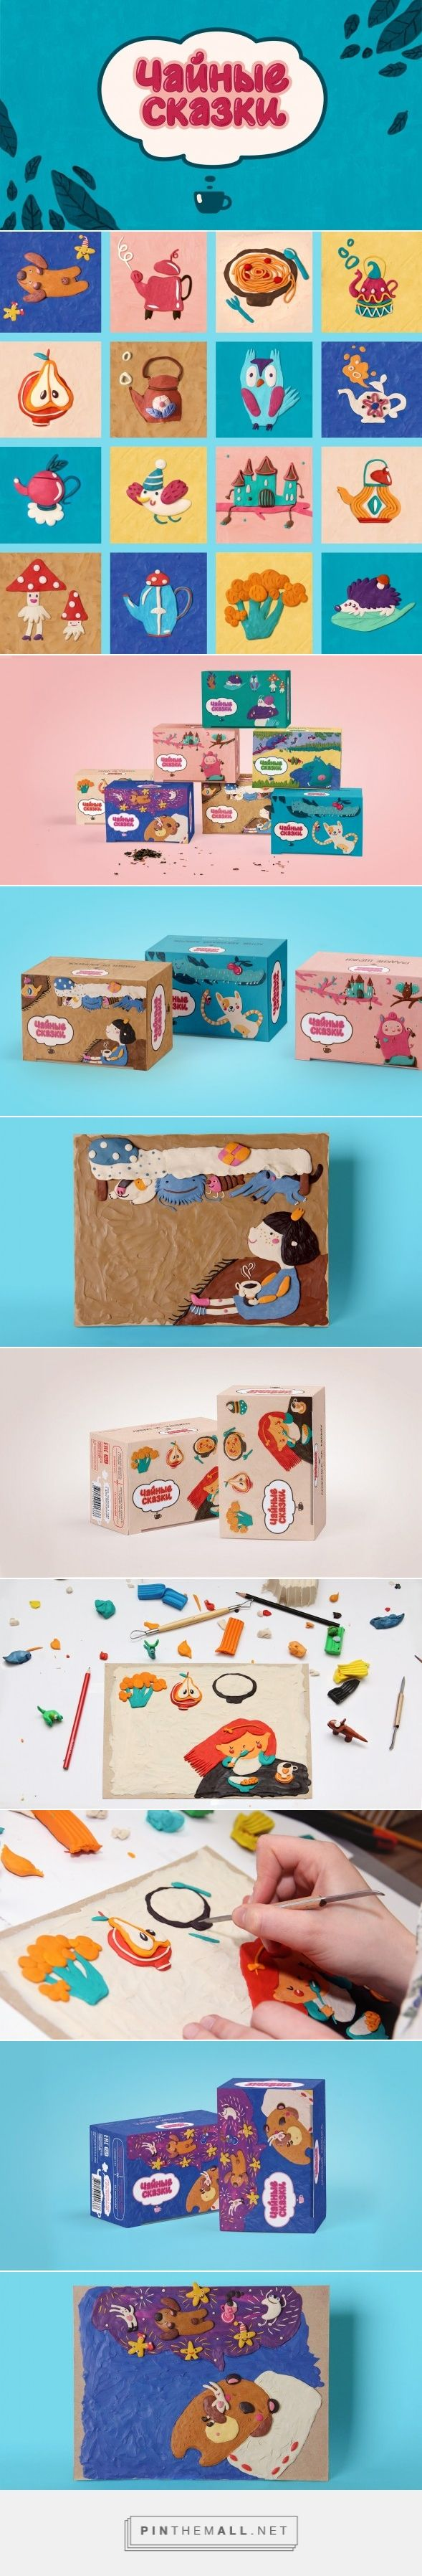 Детские травяные чаи Чайные сказки | What The Pack?